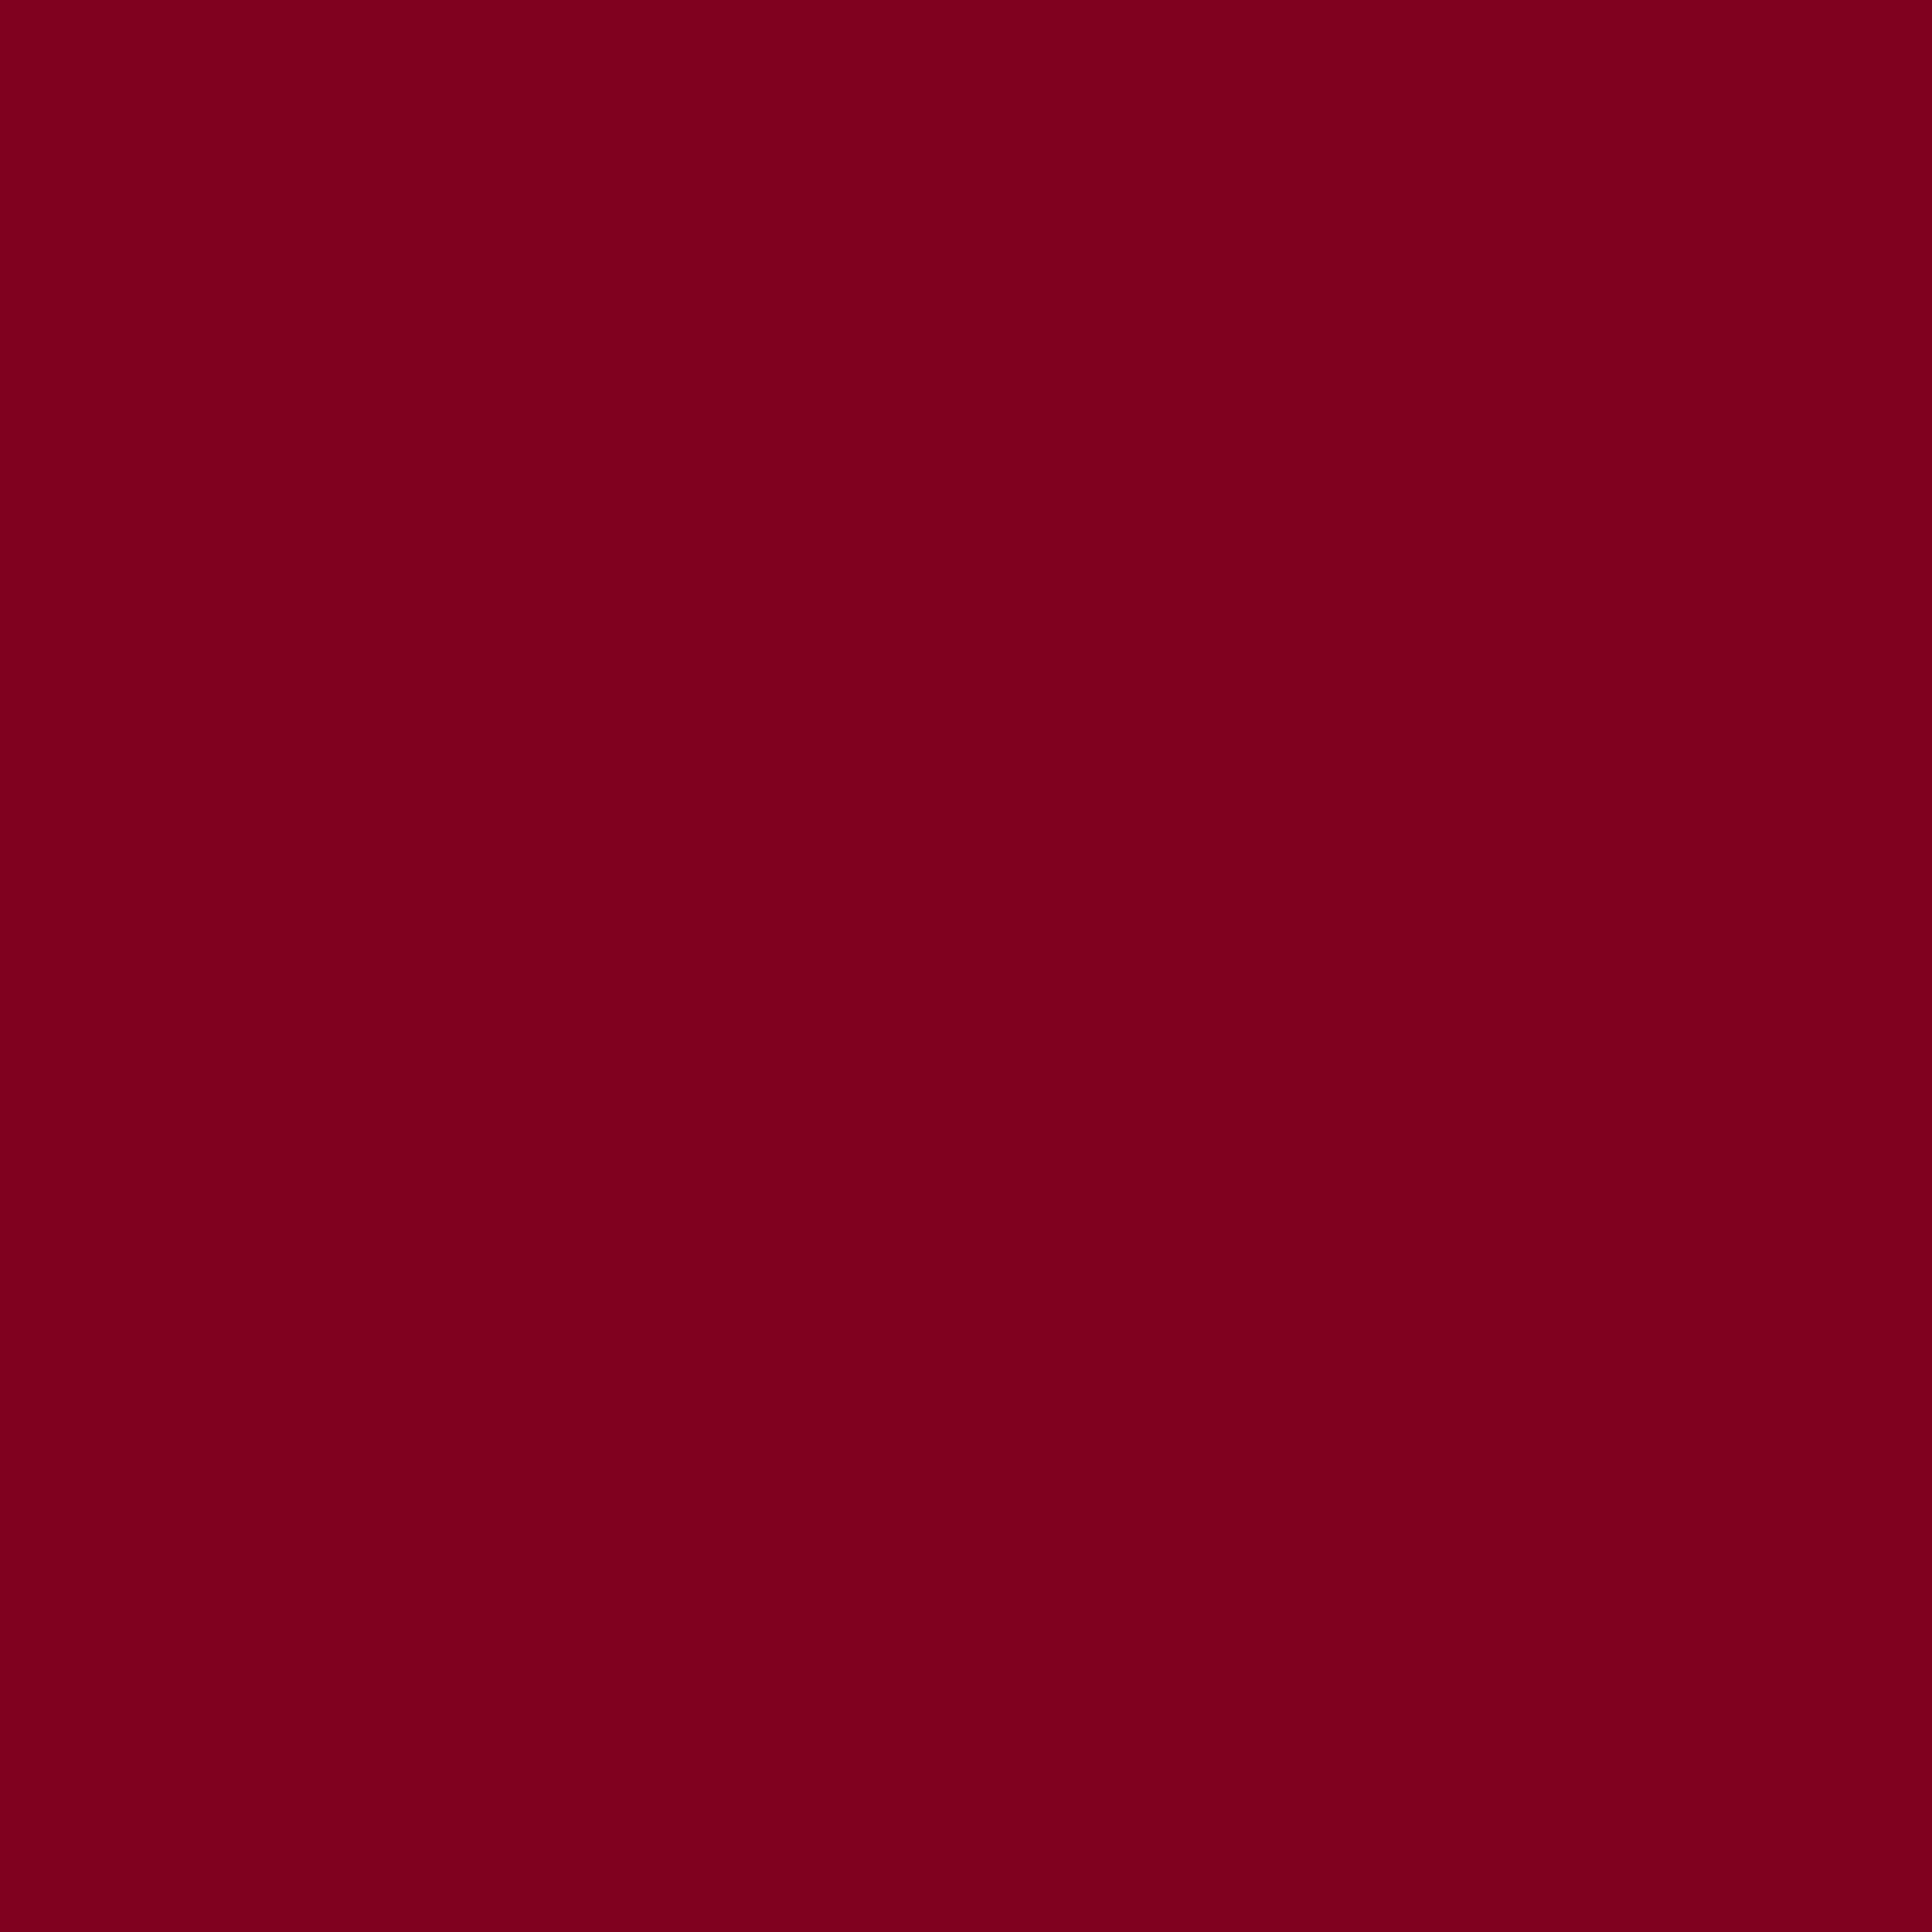 3600x3600 Burgundy Solid Color Background